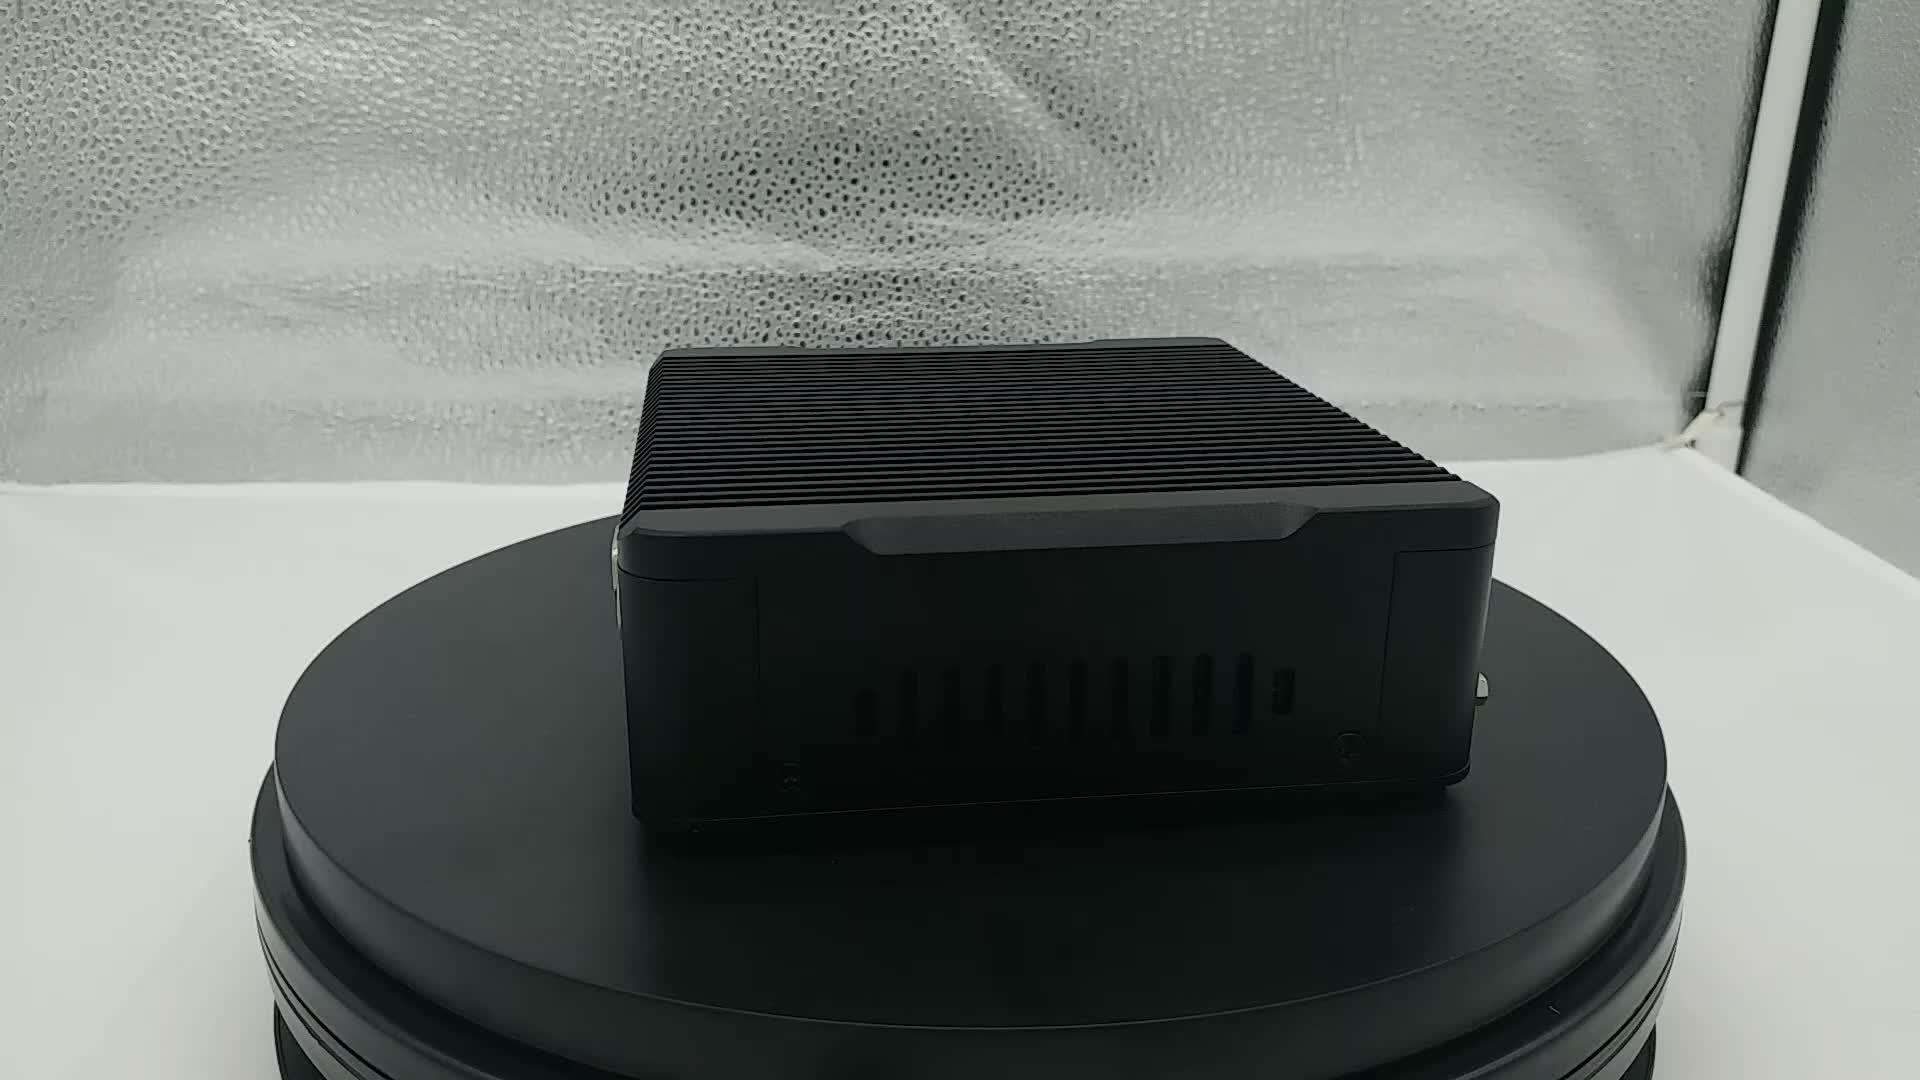 Smallest Embeded Fanless PC  SDJ1906 Mini Computer